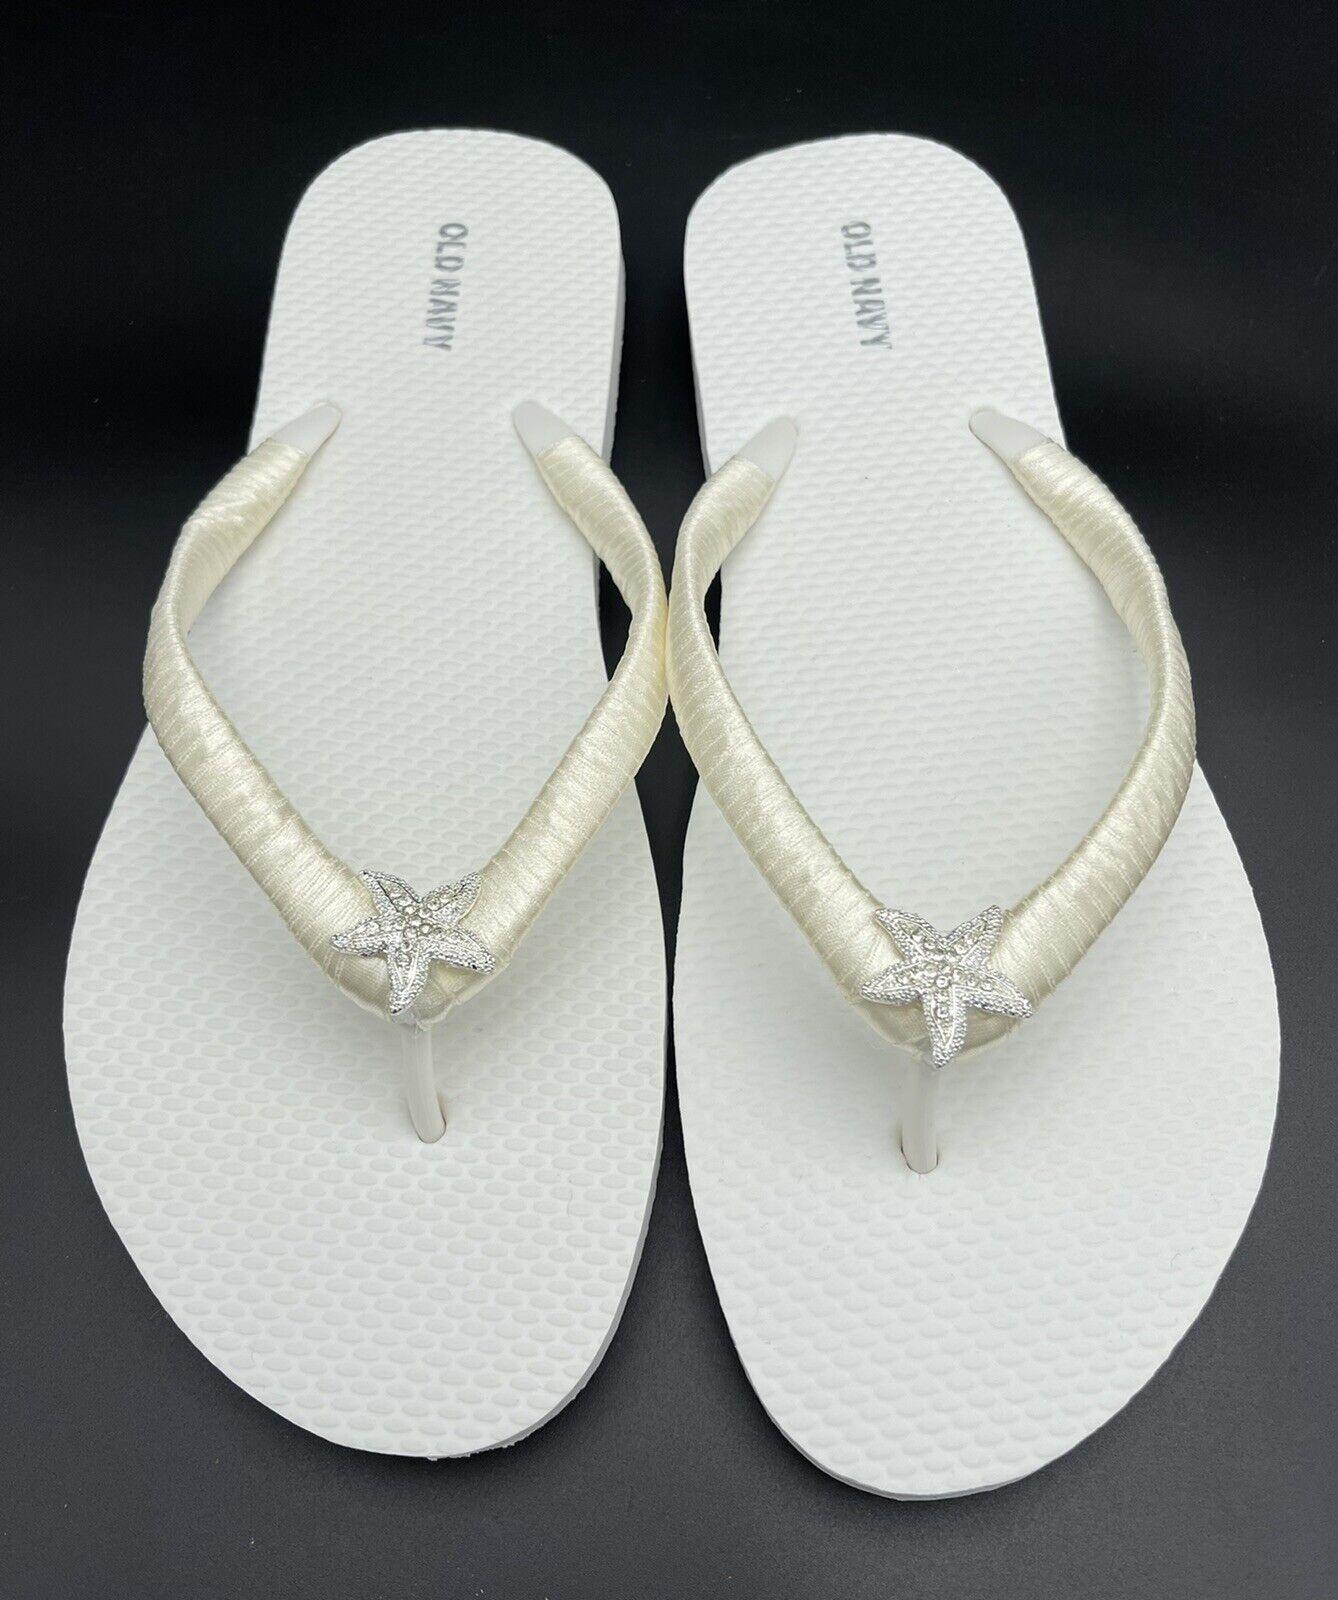 Ivory Bridal Flip Flops, Starfish Flip Flops, White Bridal Flip Flops W Size 7.